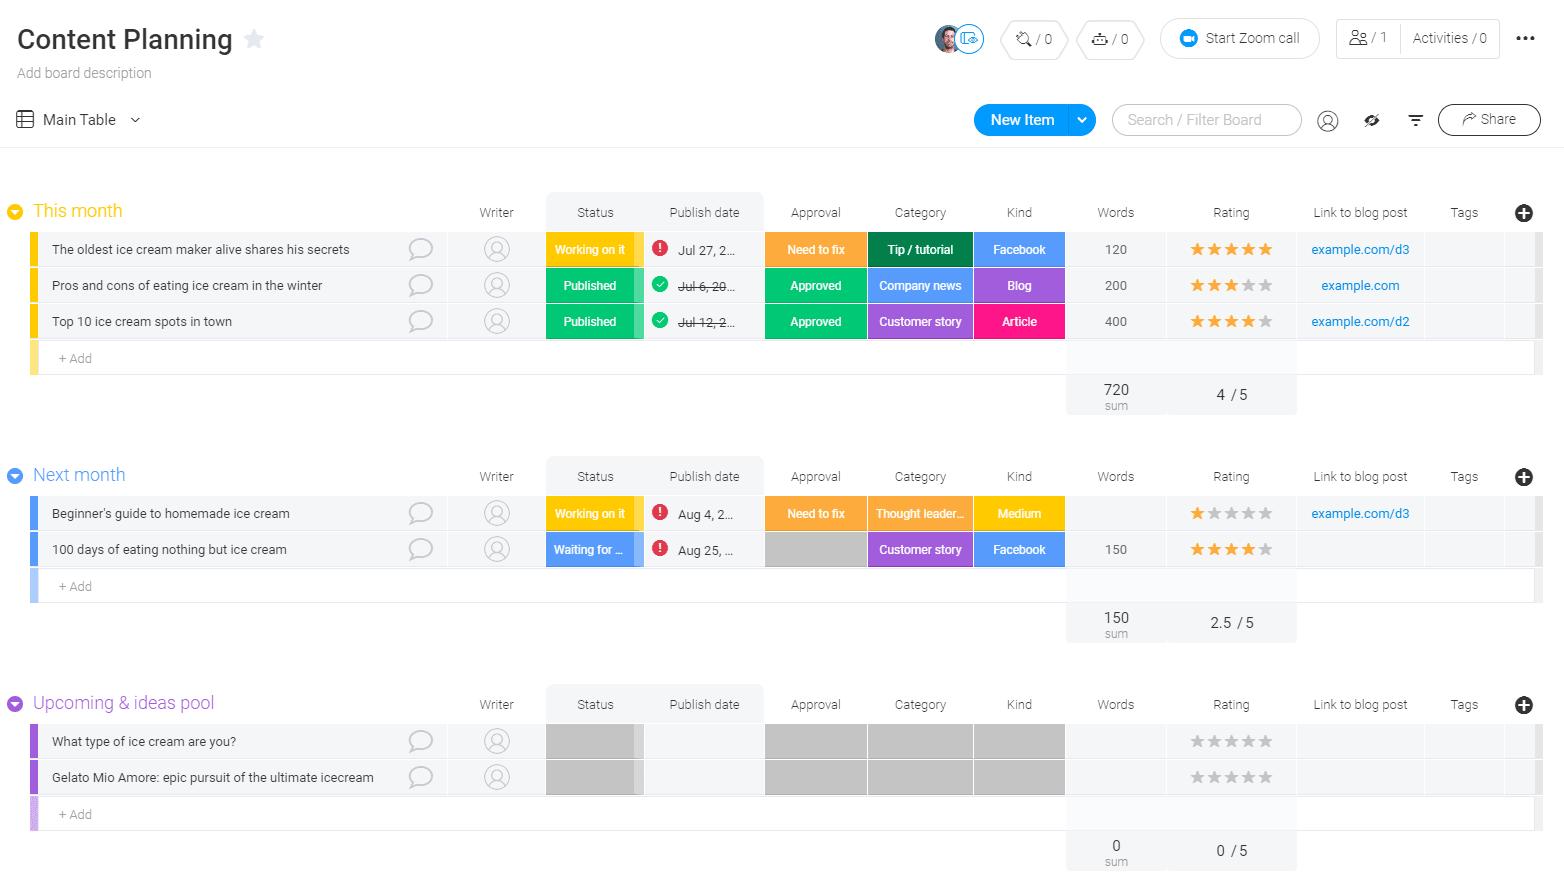 monday.com content planning template